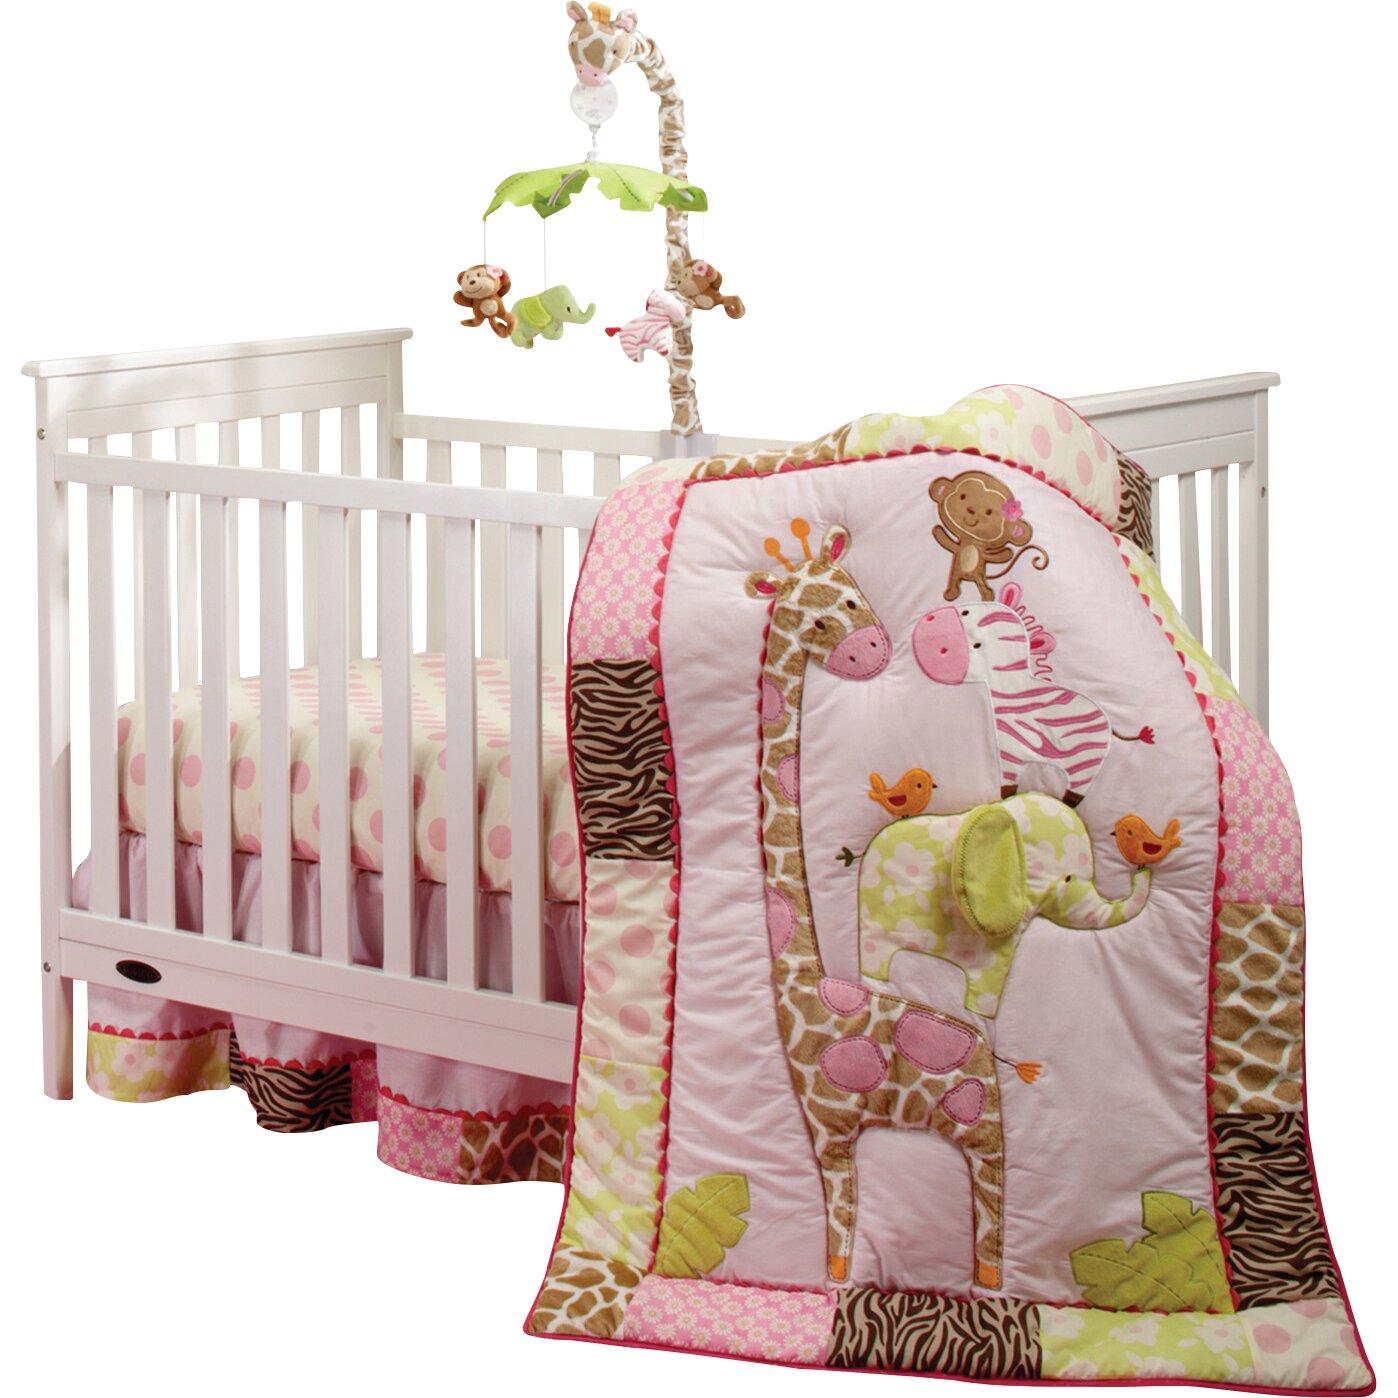 Pink leopard print bedding -  Jungle 4 Piece Crib Bedding Set